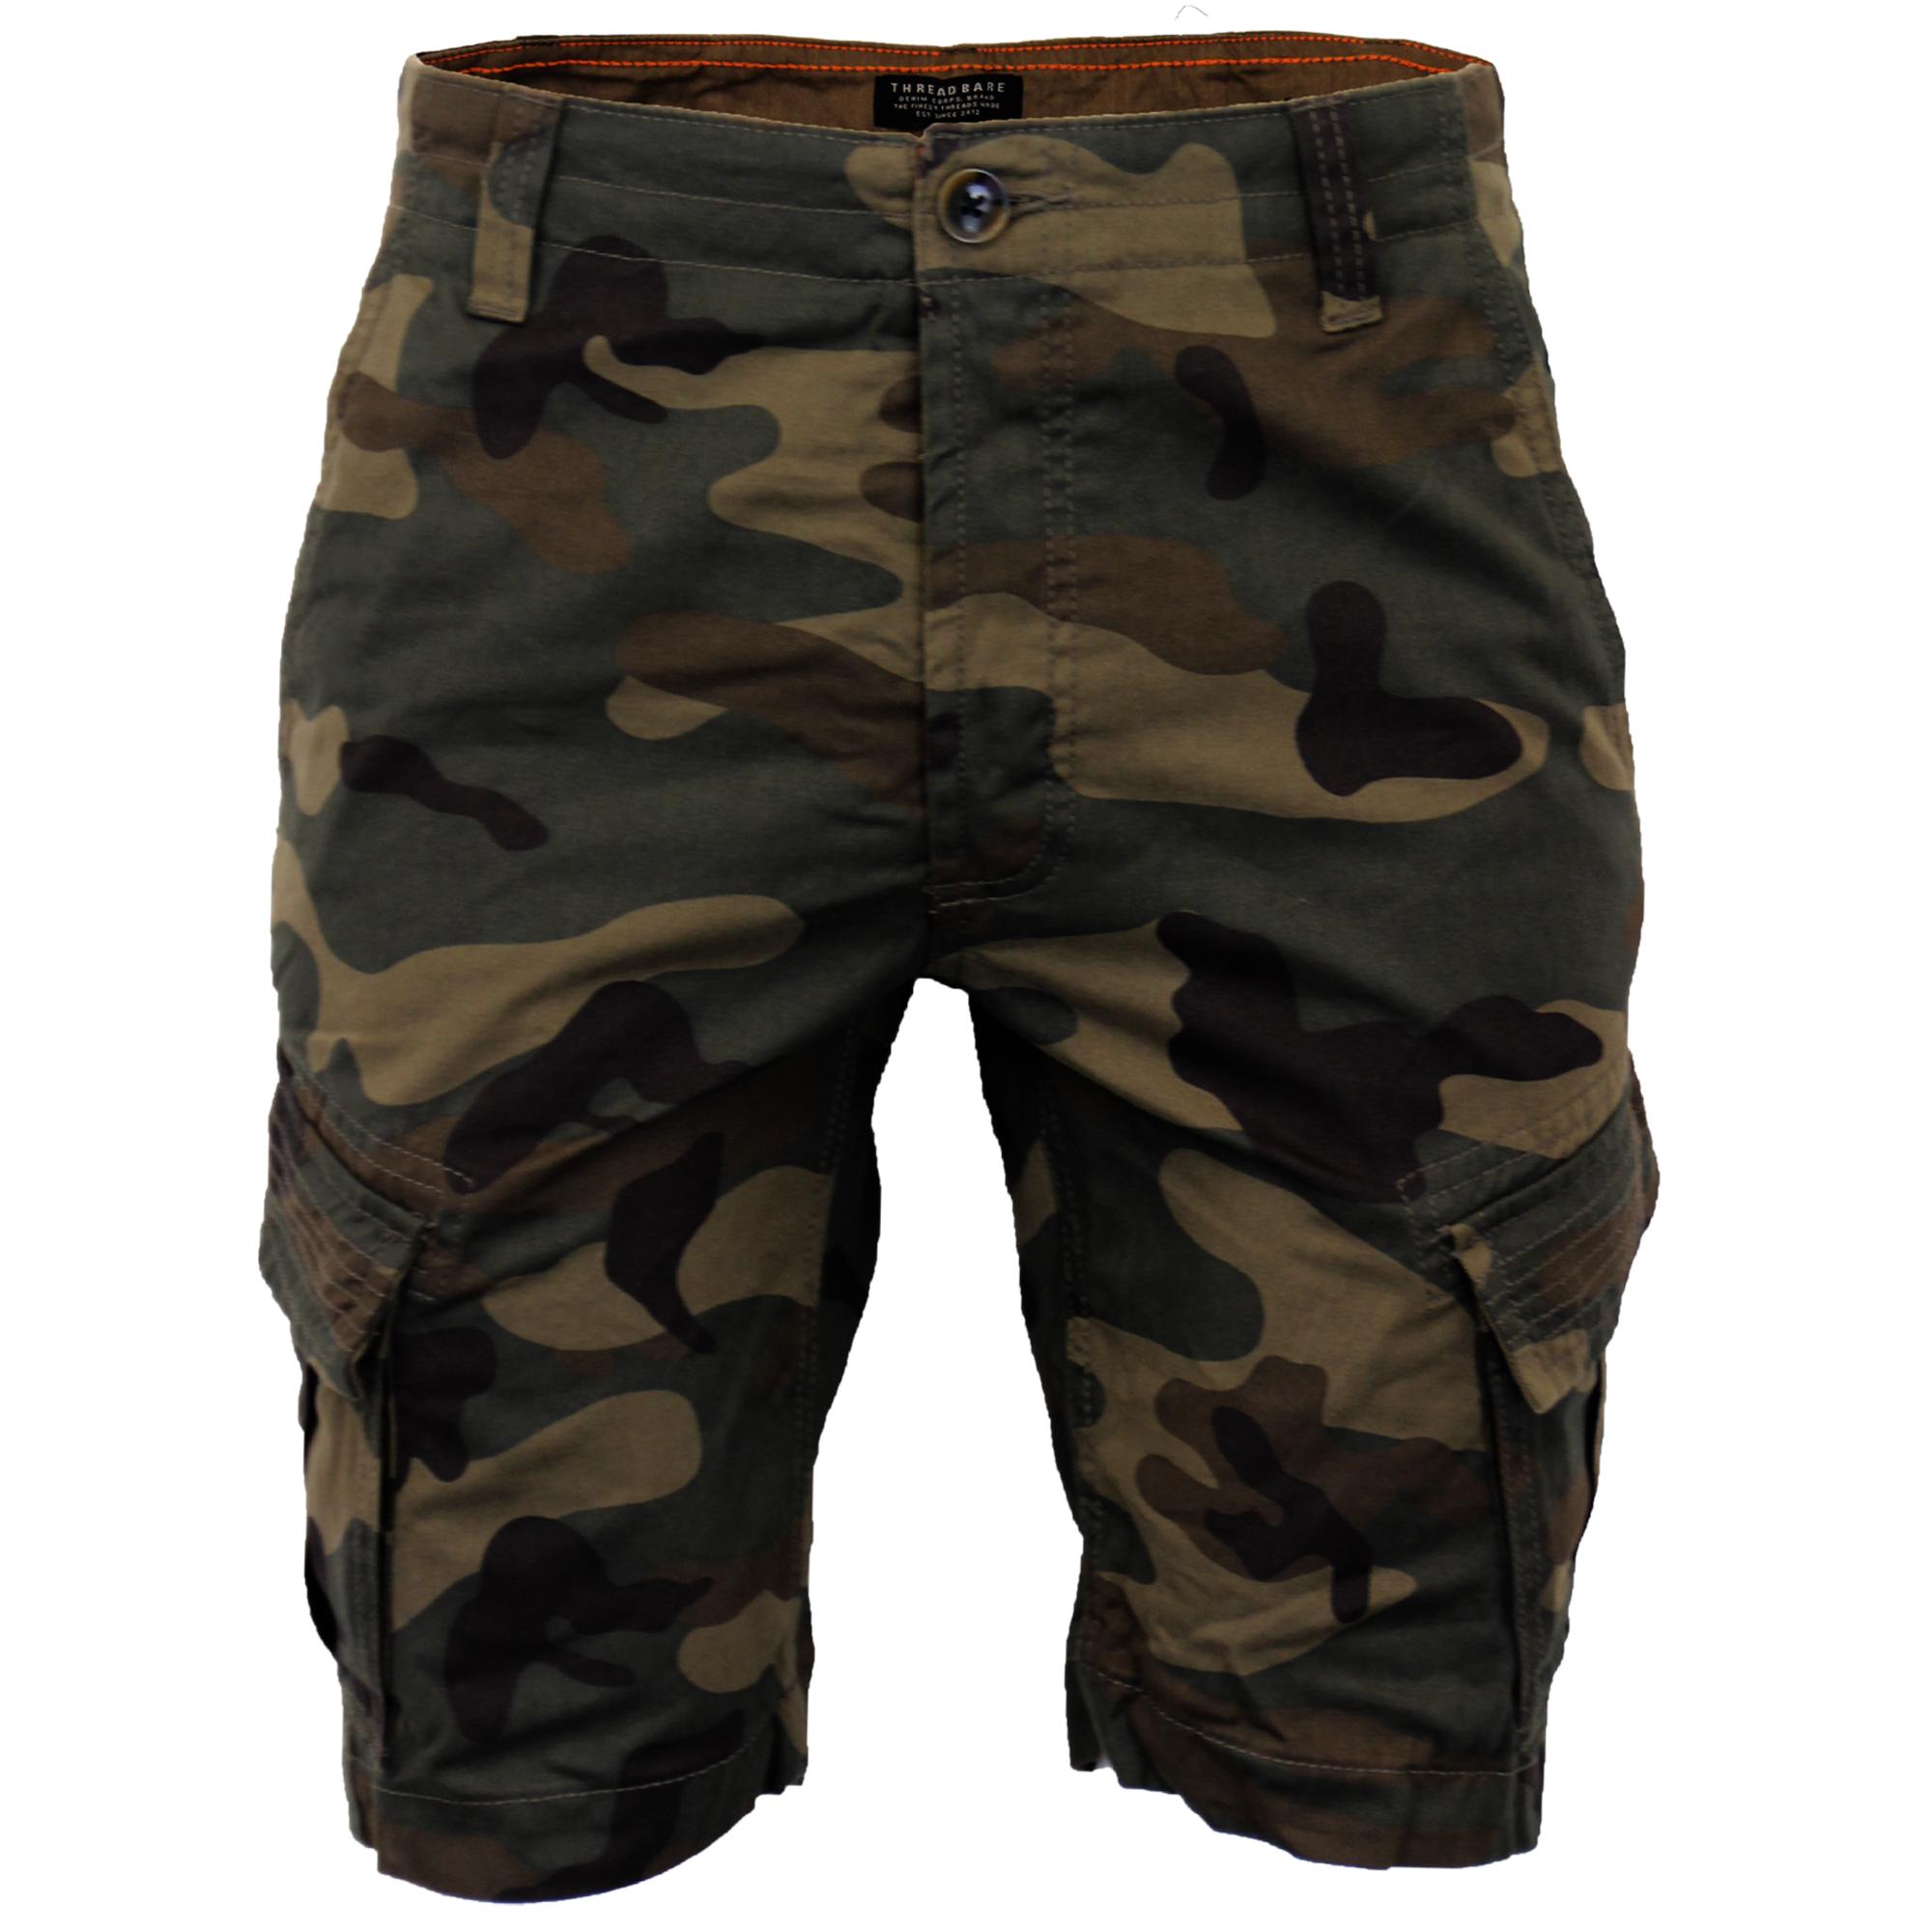 Mens-Cargo-Chino-Shorts-Threadbare-Combat-Knee-Length-Westace-Military-Summer thumbnail 10